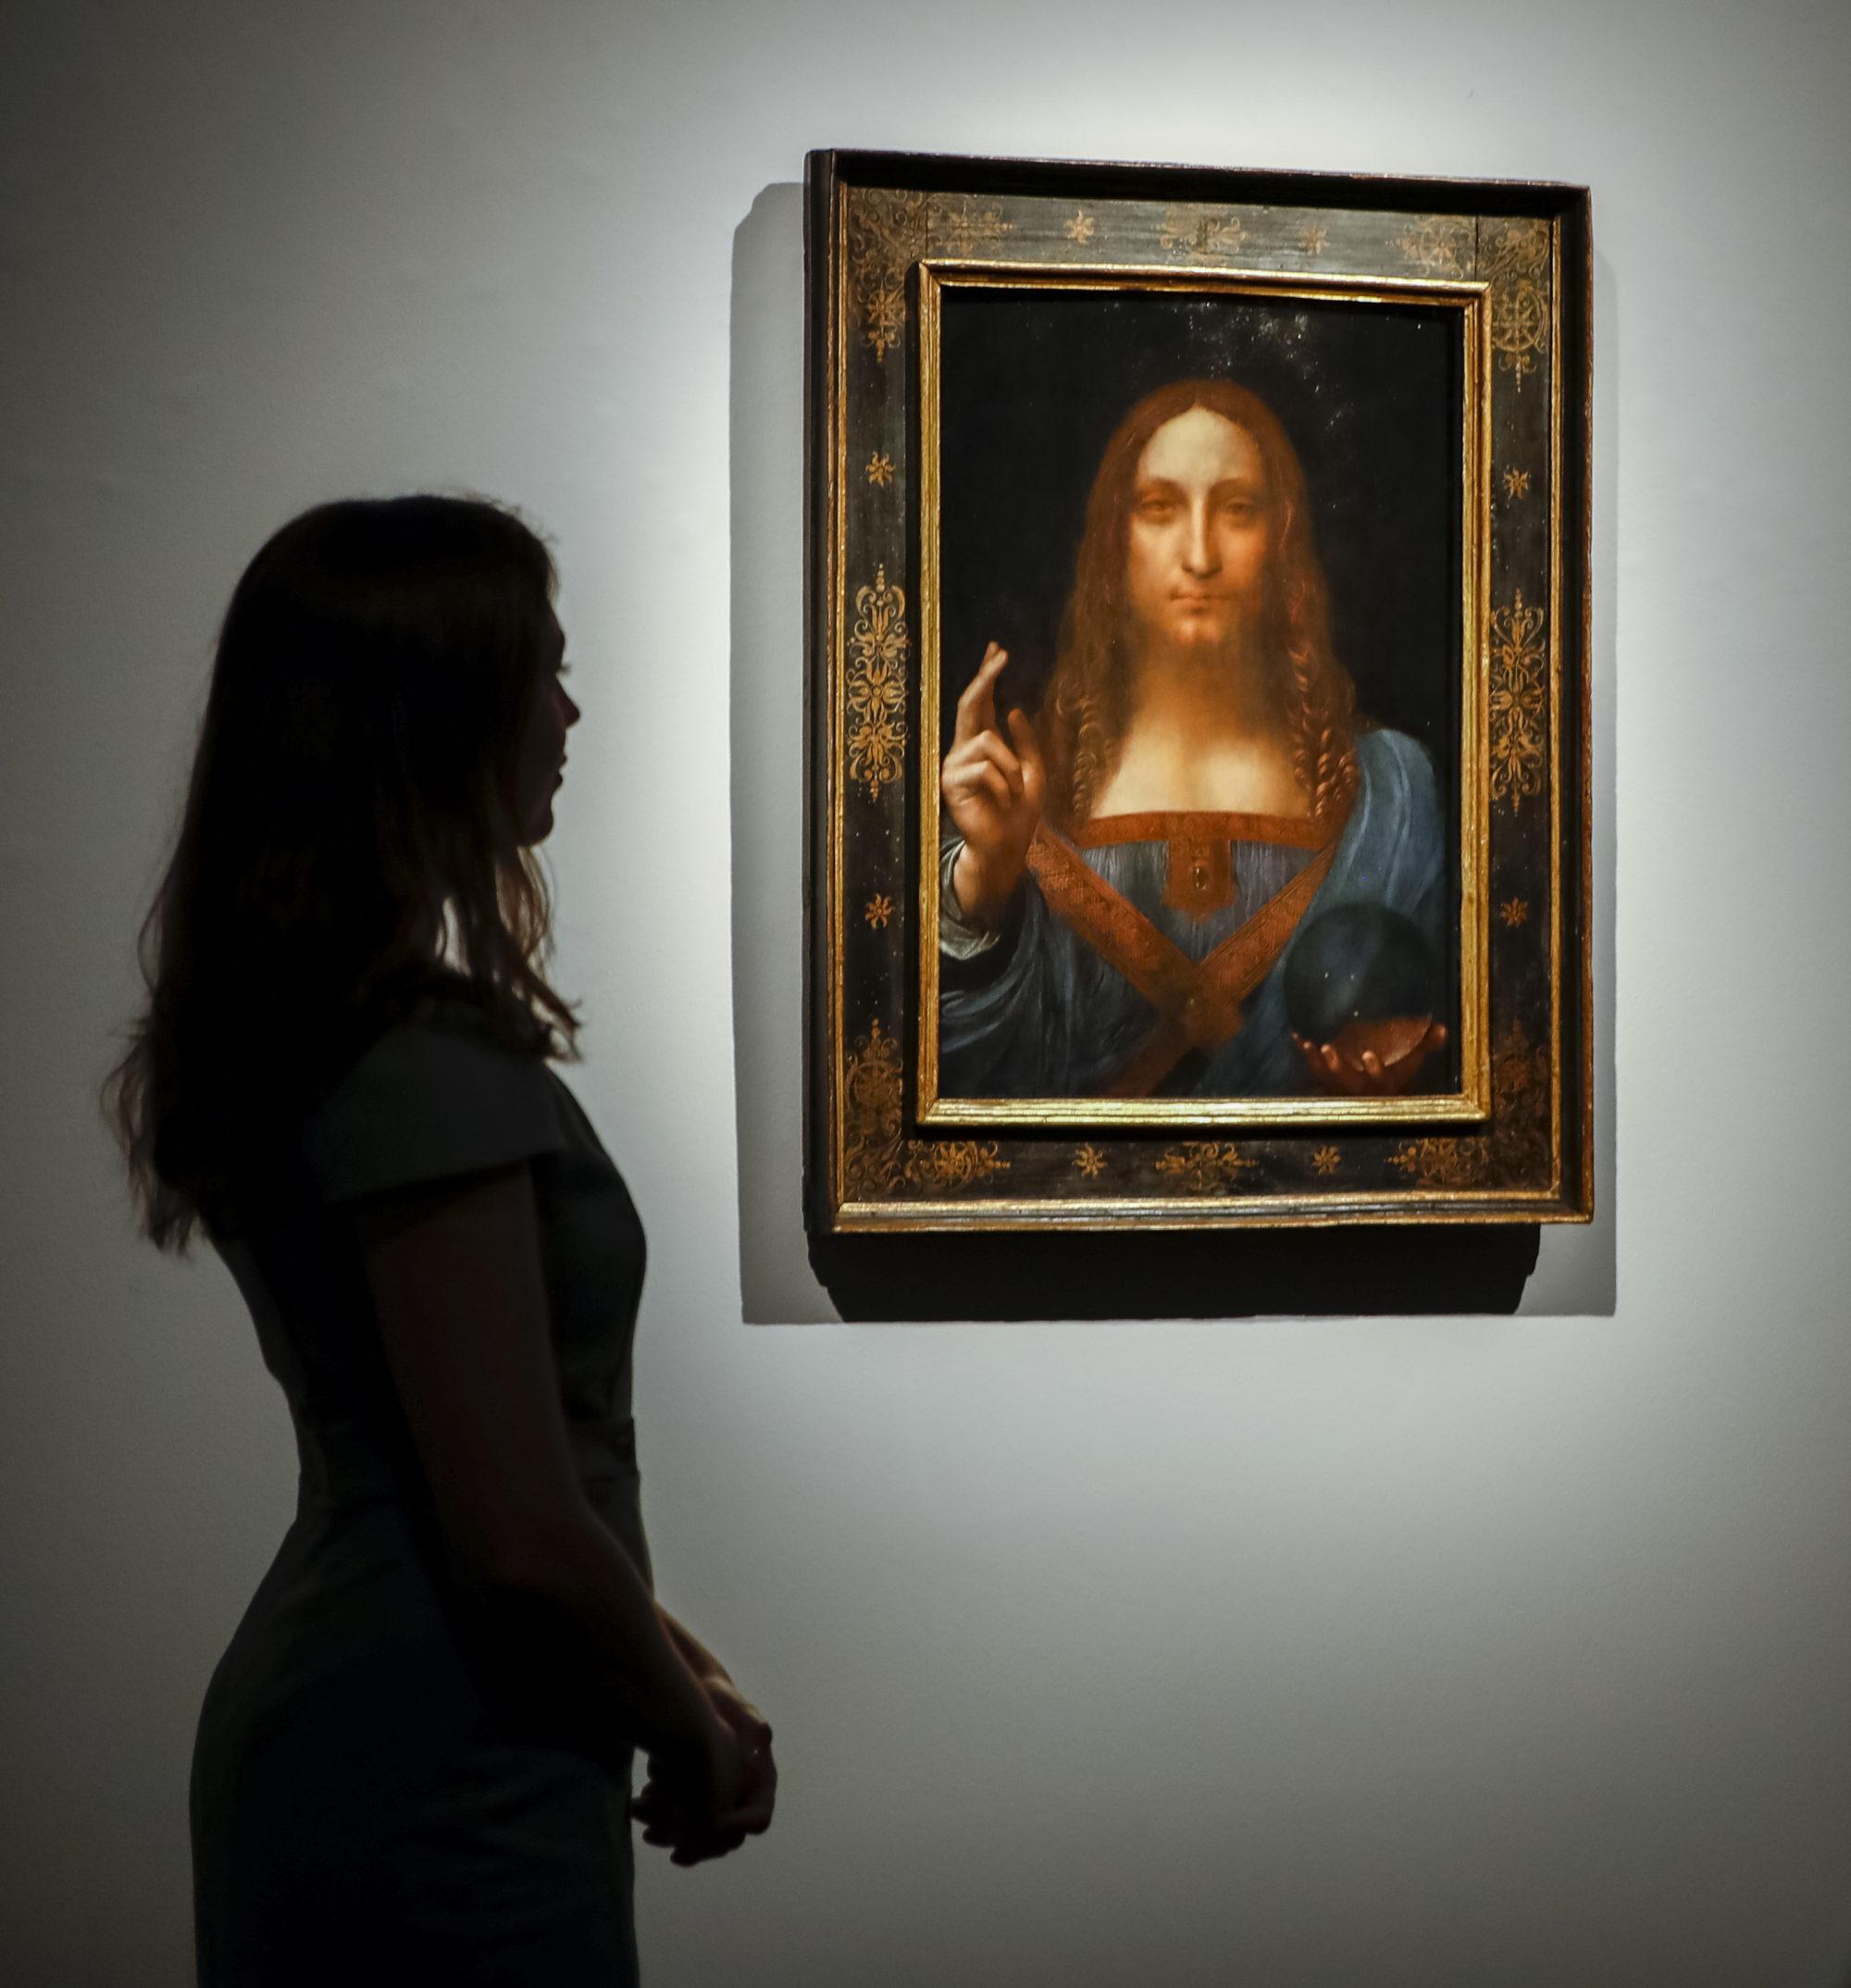 So You Just Bought A 450 Million Leonardo Da Vinci